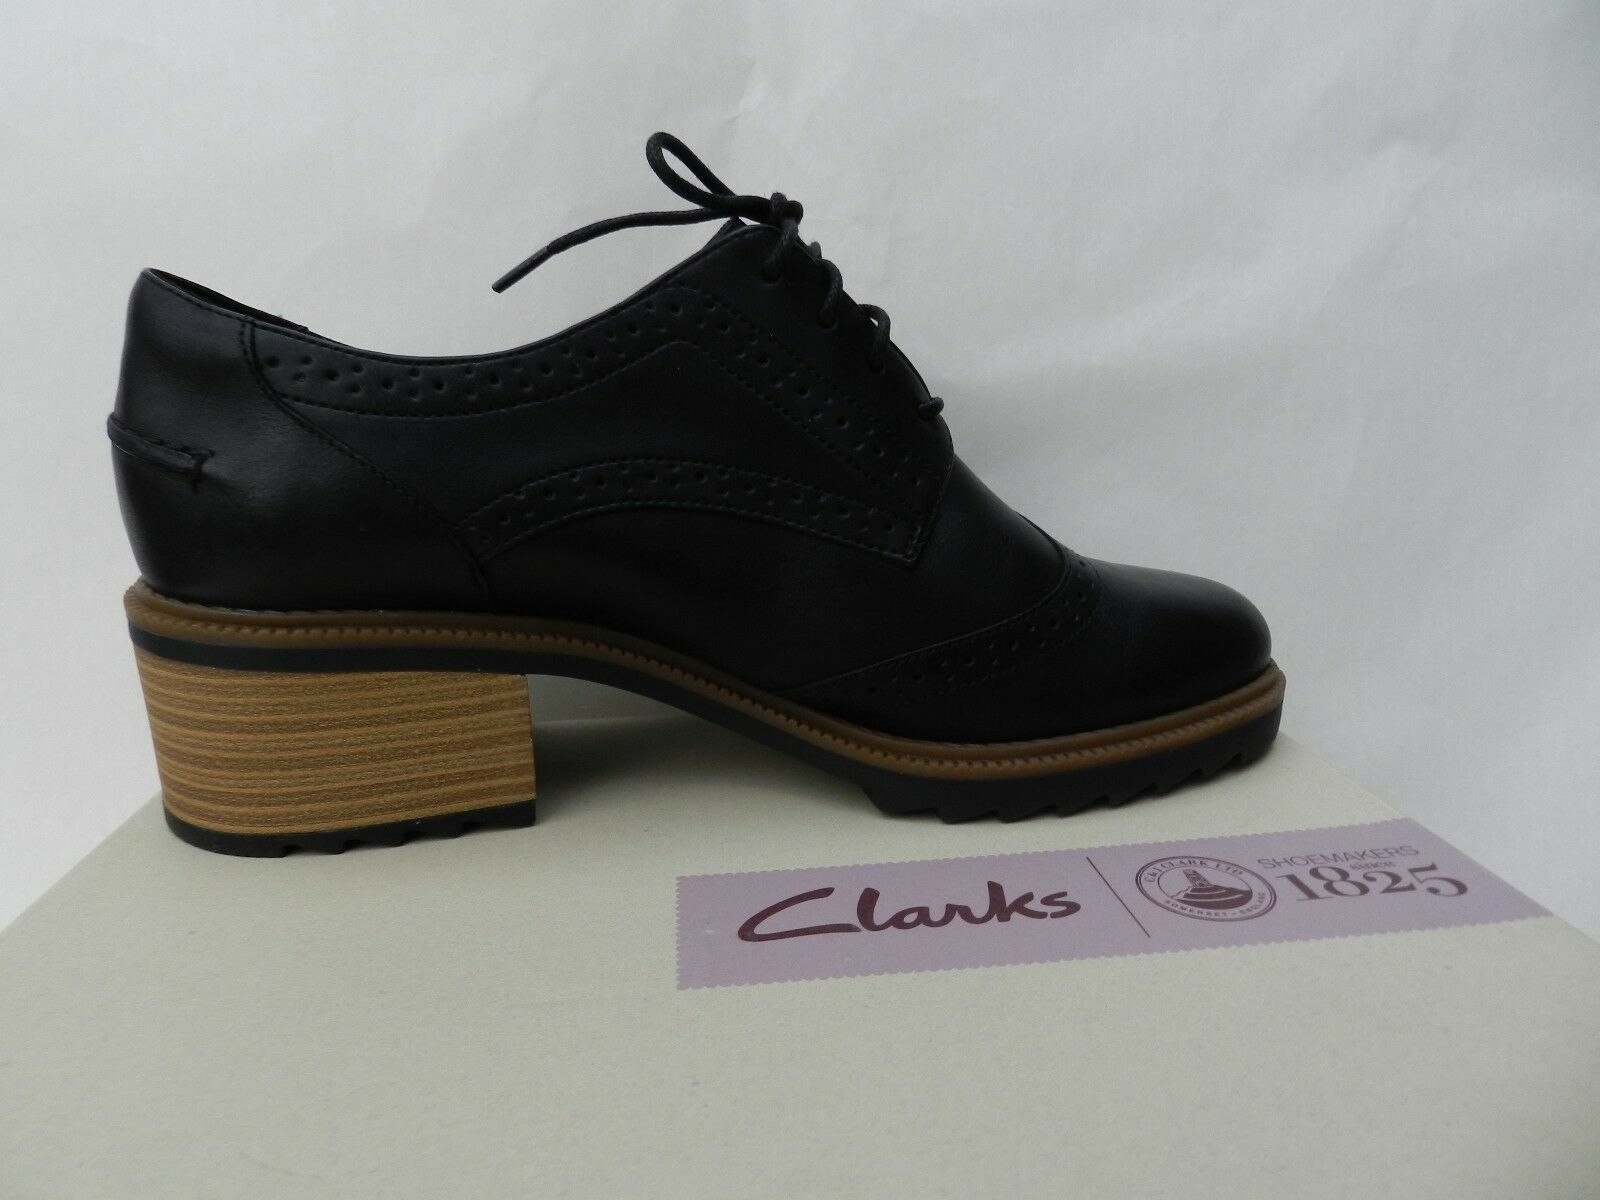 Clarks Balmer Bella shoes Femme 41.5 Escarpins Derbies Oxford UK7.5 D Neuf